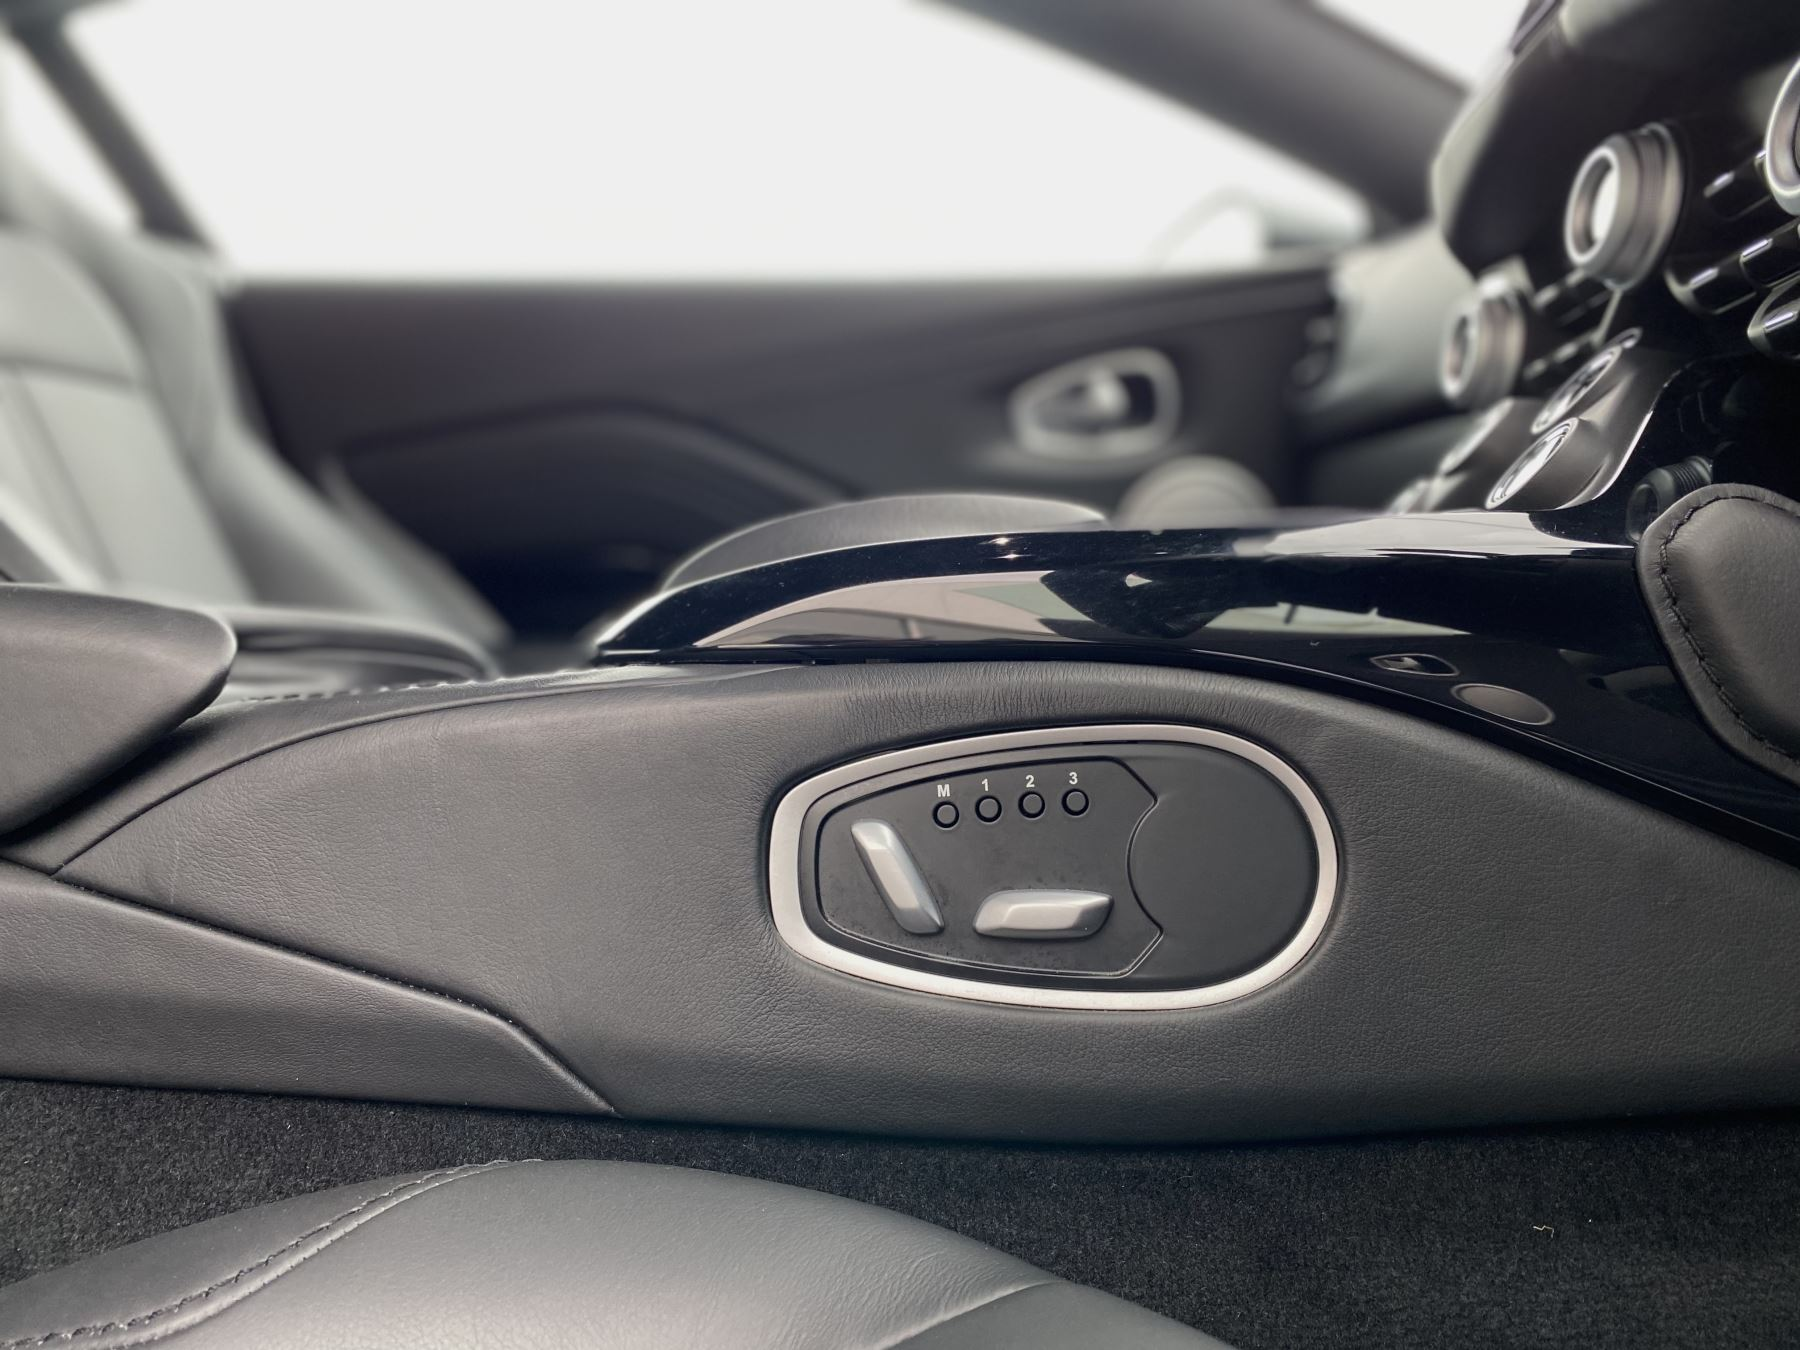 Aston Martin New Vantage 2dr ZF 8 Speed Auto. 4.0 Twin Turbo ZF Gearbox  Reversing Camera Heated Seats Ceramic Brakes image 34